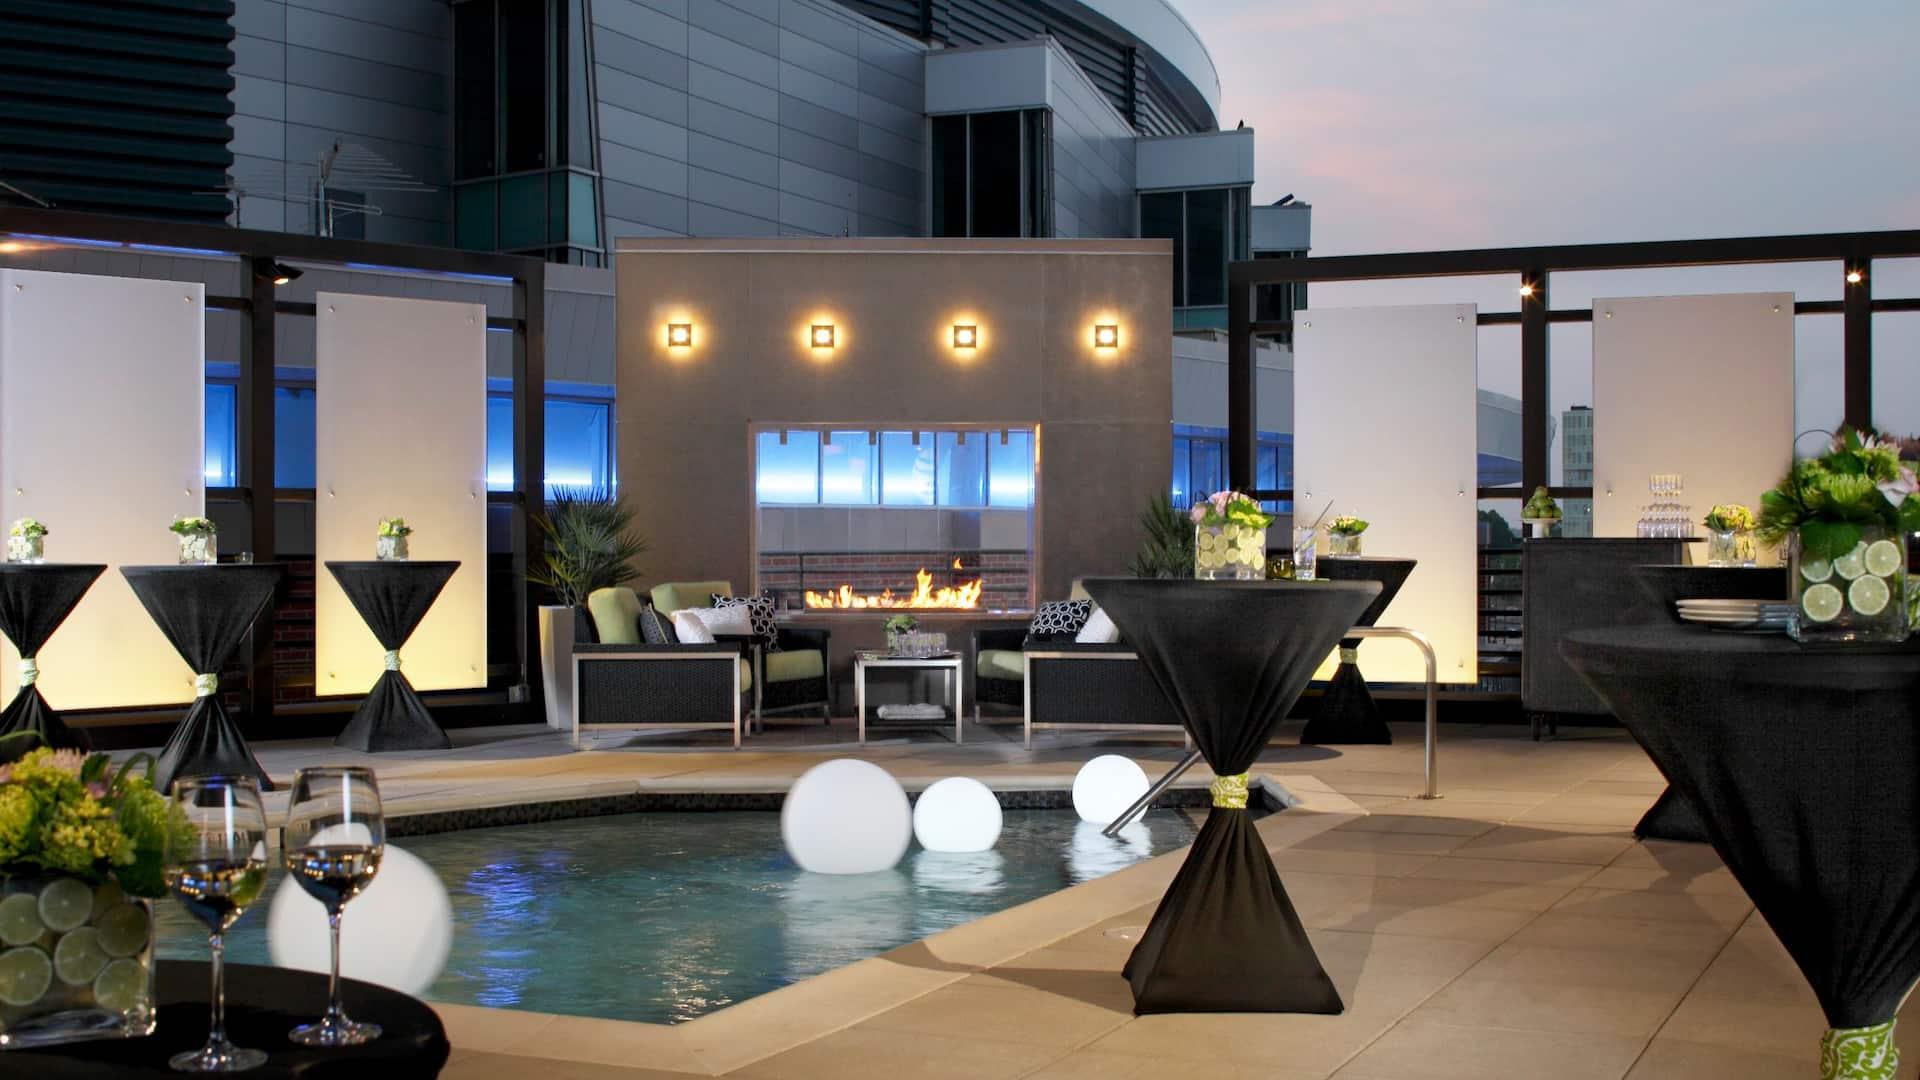 Hyatt House Exterior Rooftop Terrace Pool